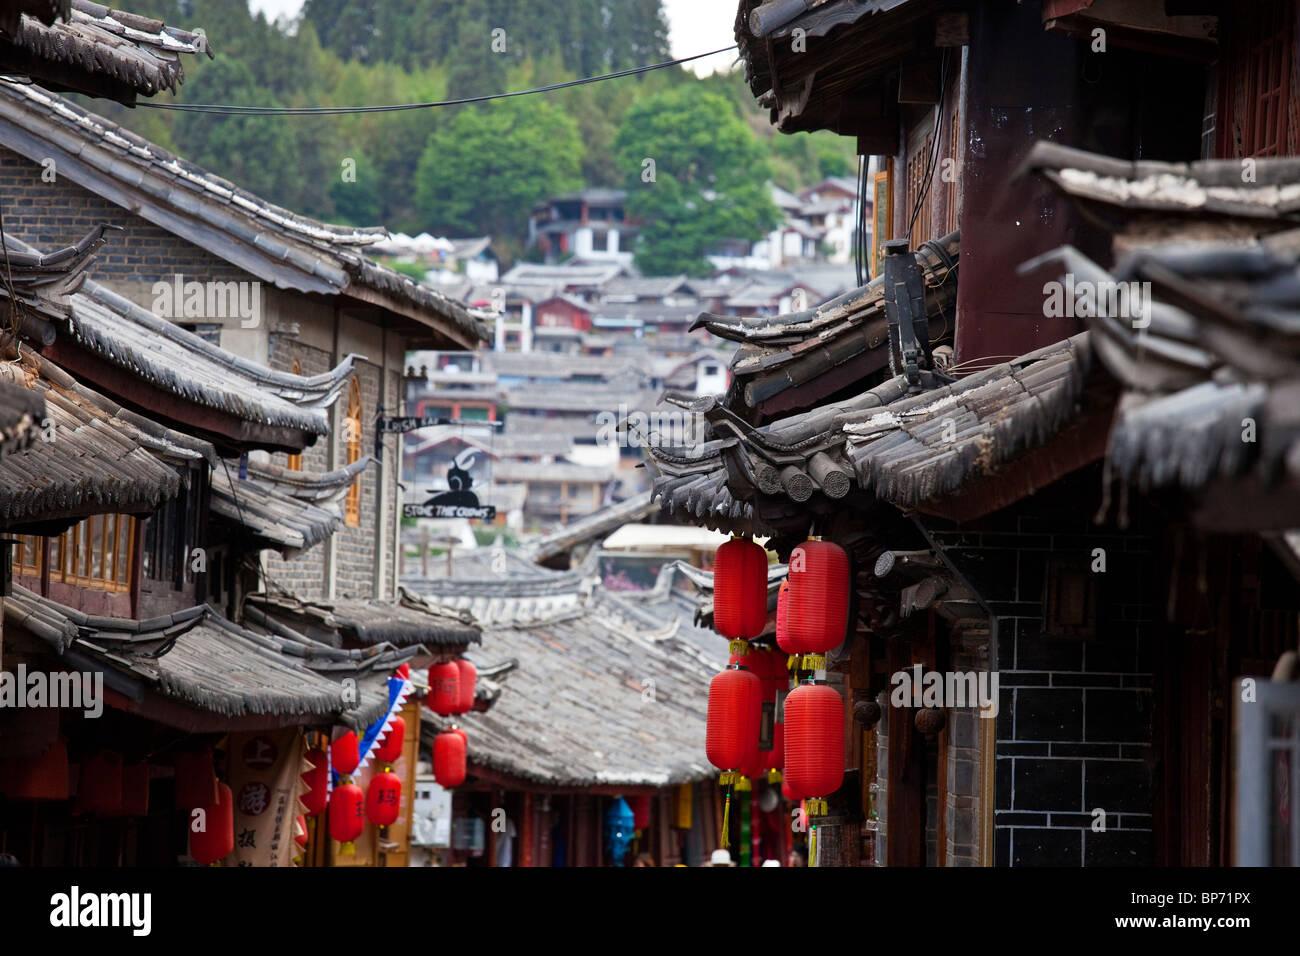 Rooftop eaves, old town, Lijiang, Yunnan Province, China - Stock Image